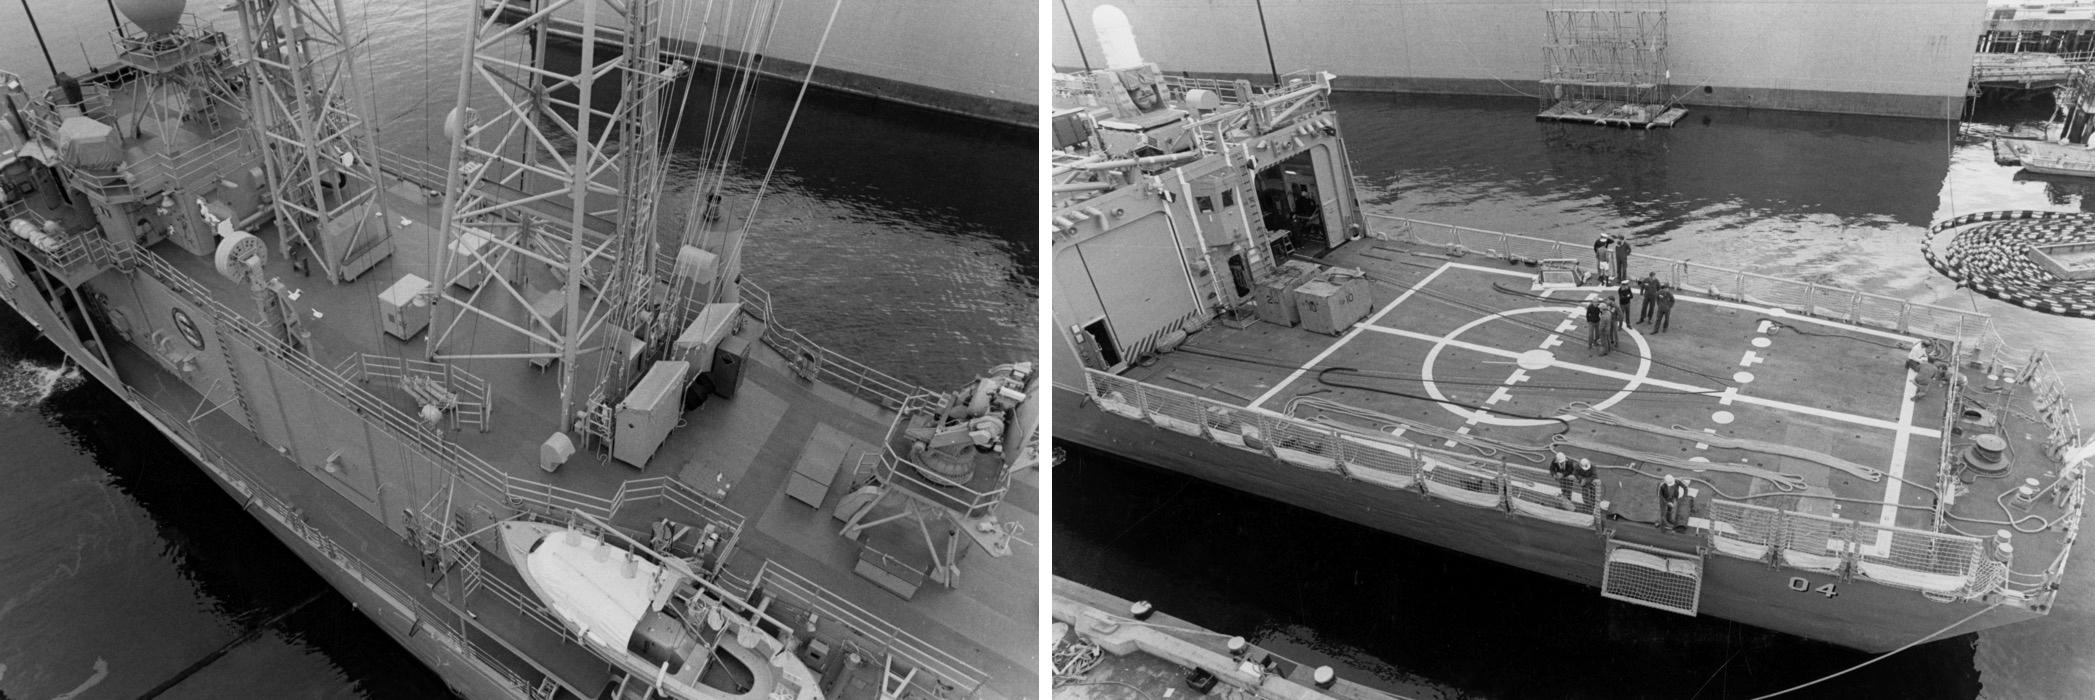 HMAS Darwin | Royal Australian Navy